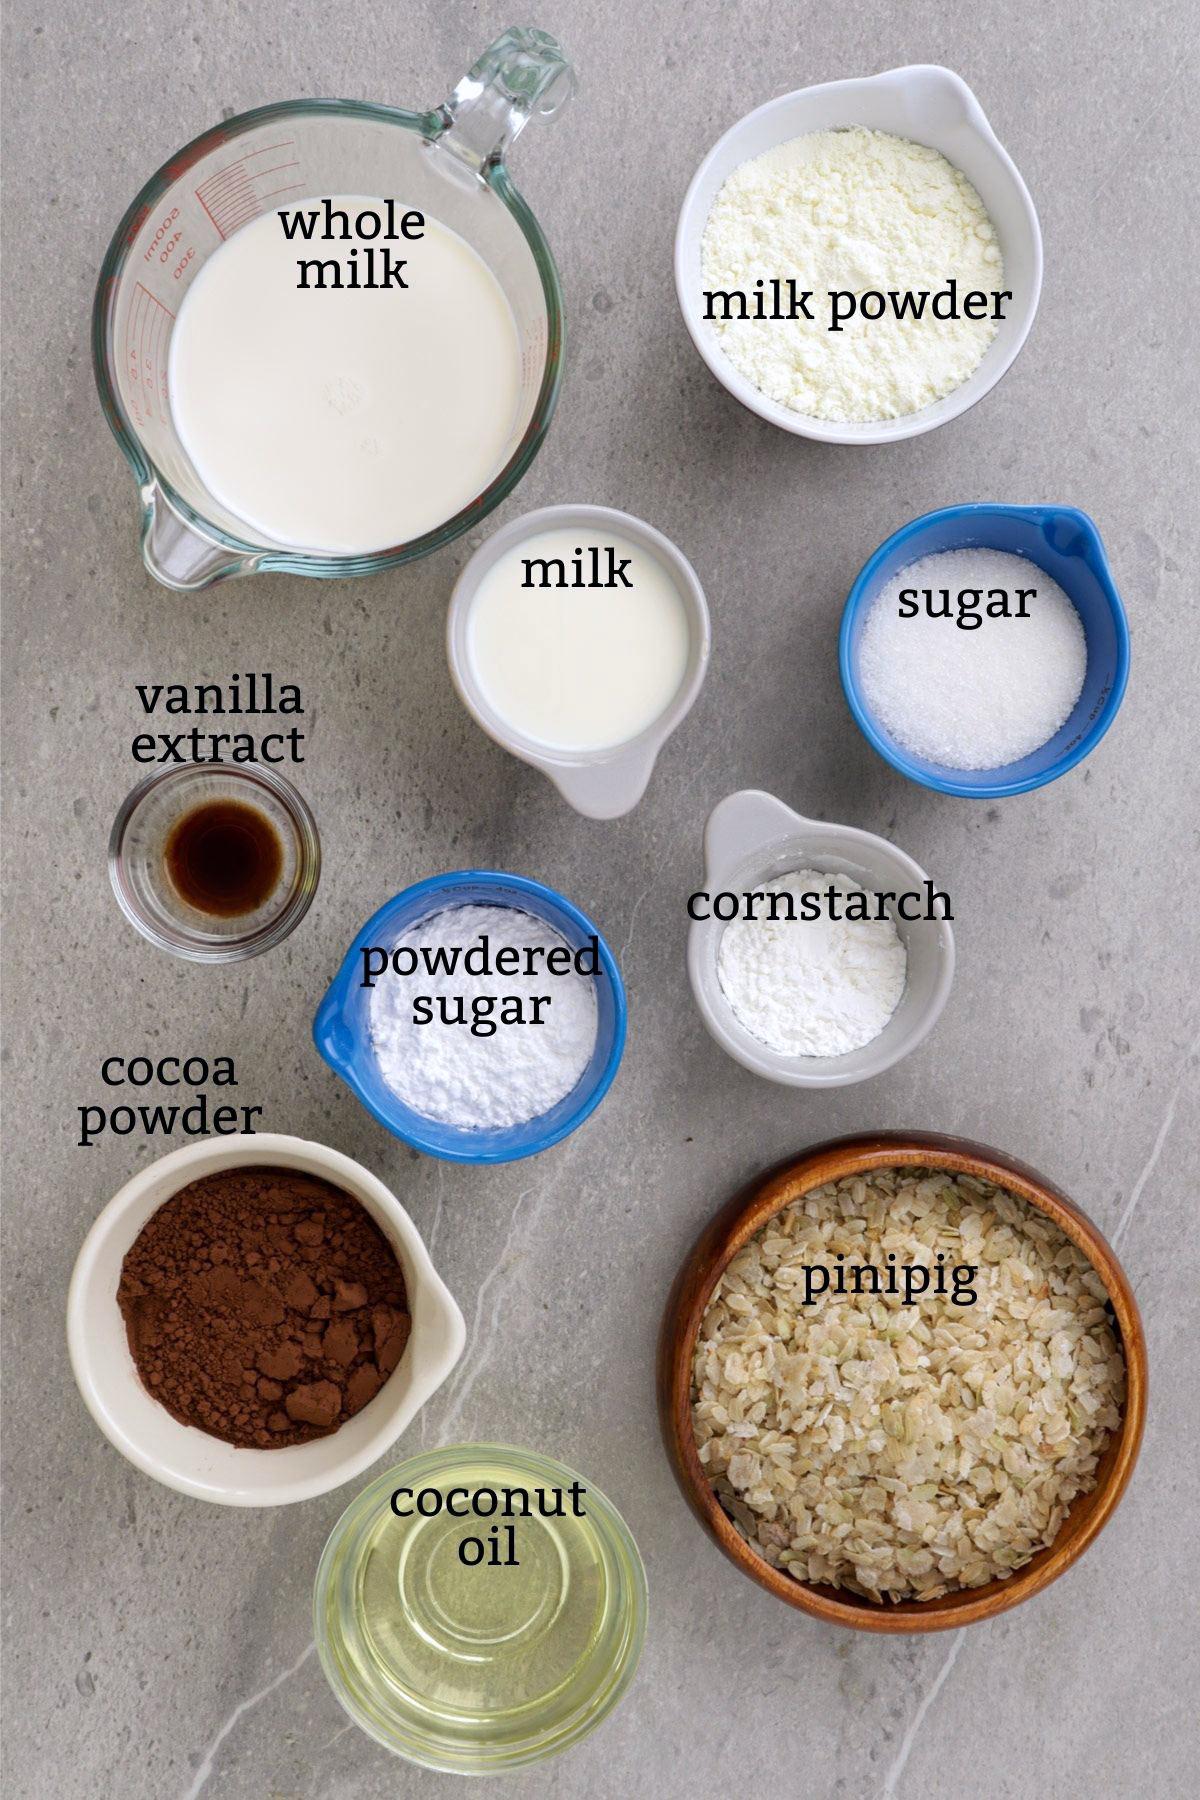 Ingredients for making Pinipig Ice Cream